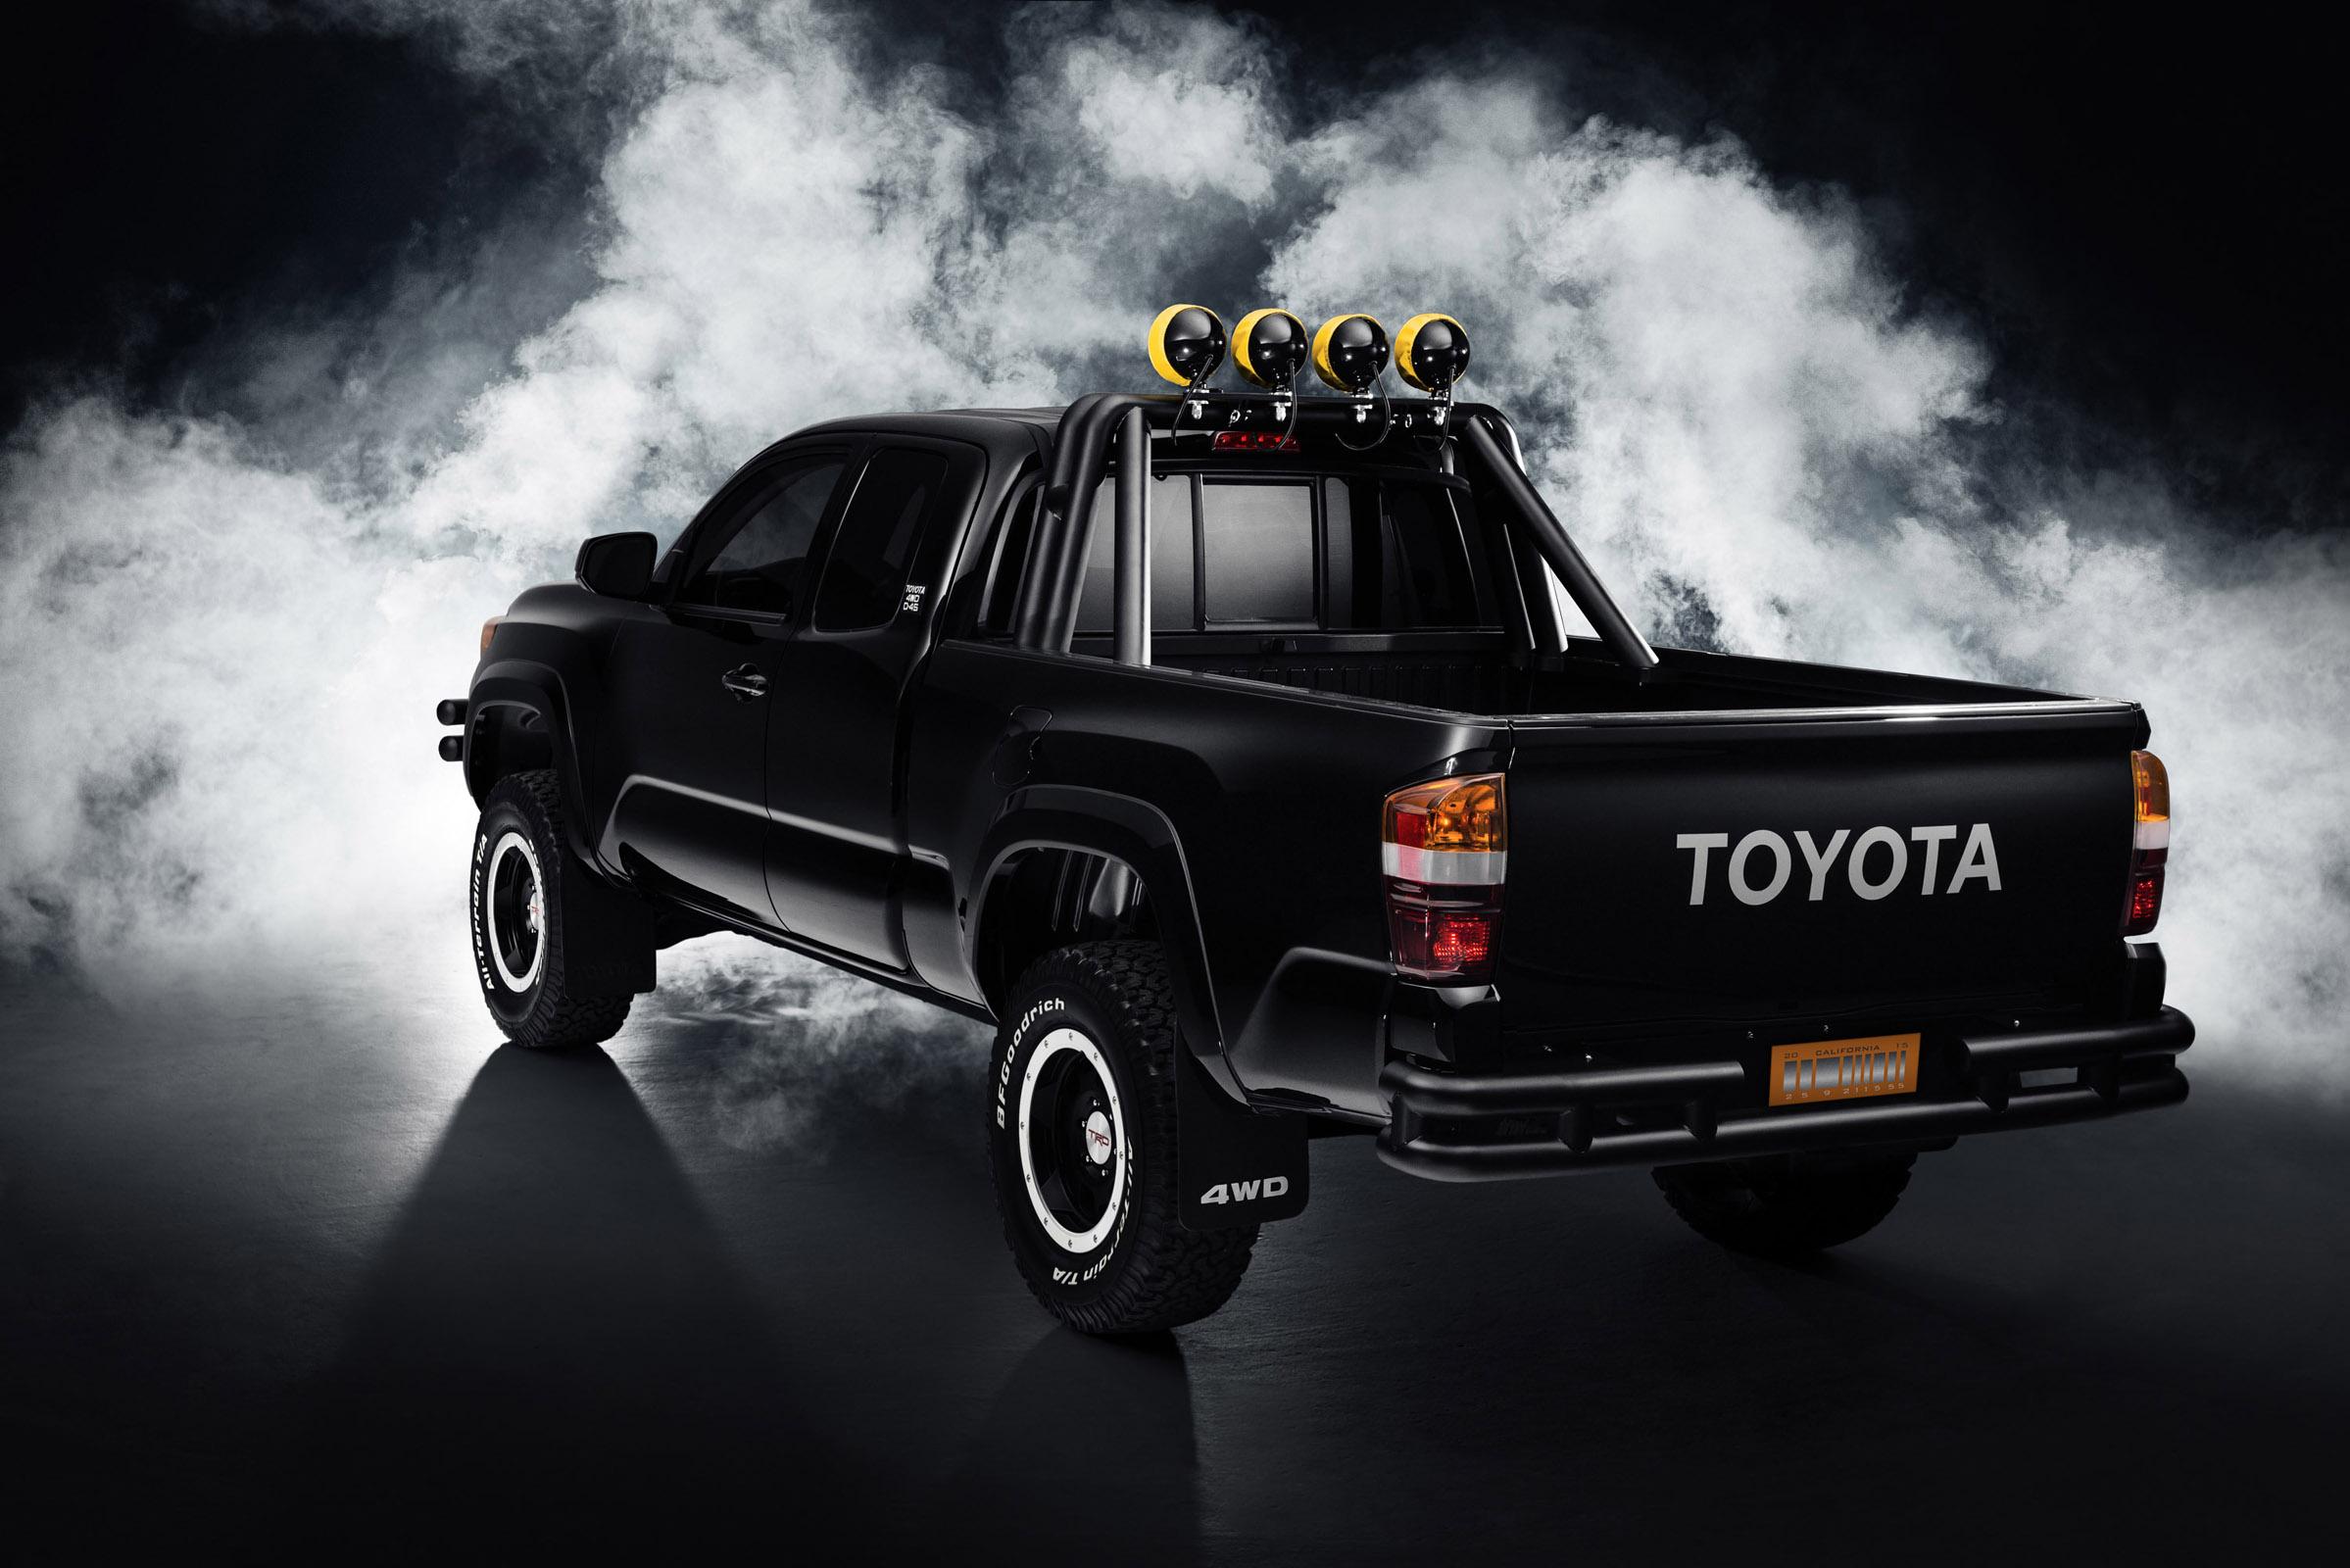 2016 BTTF Toyota Tacoma Concept